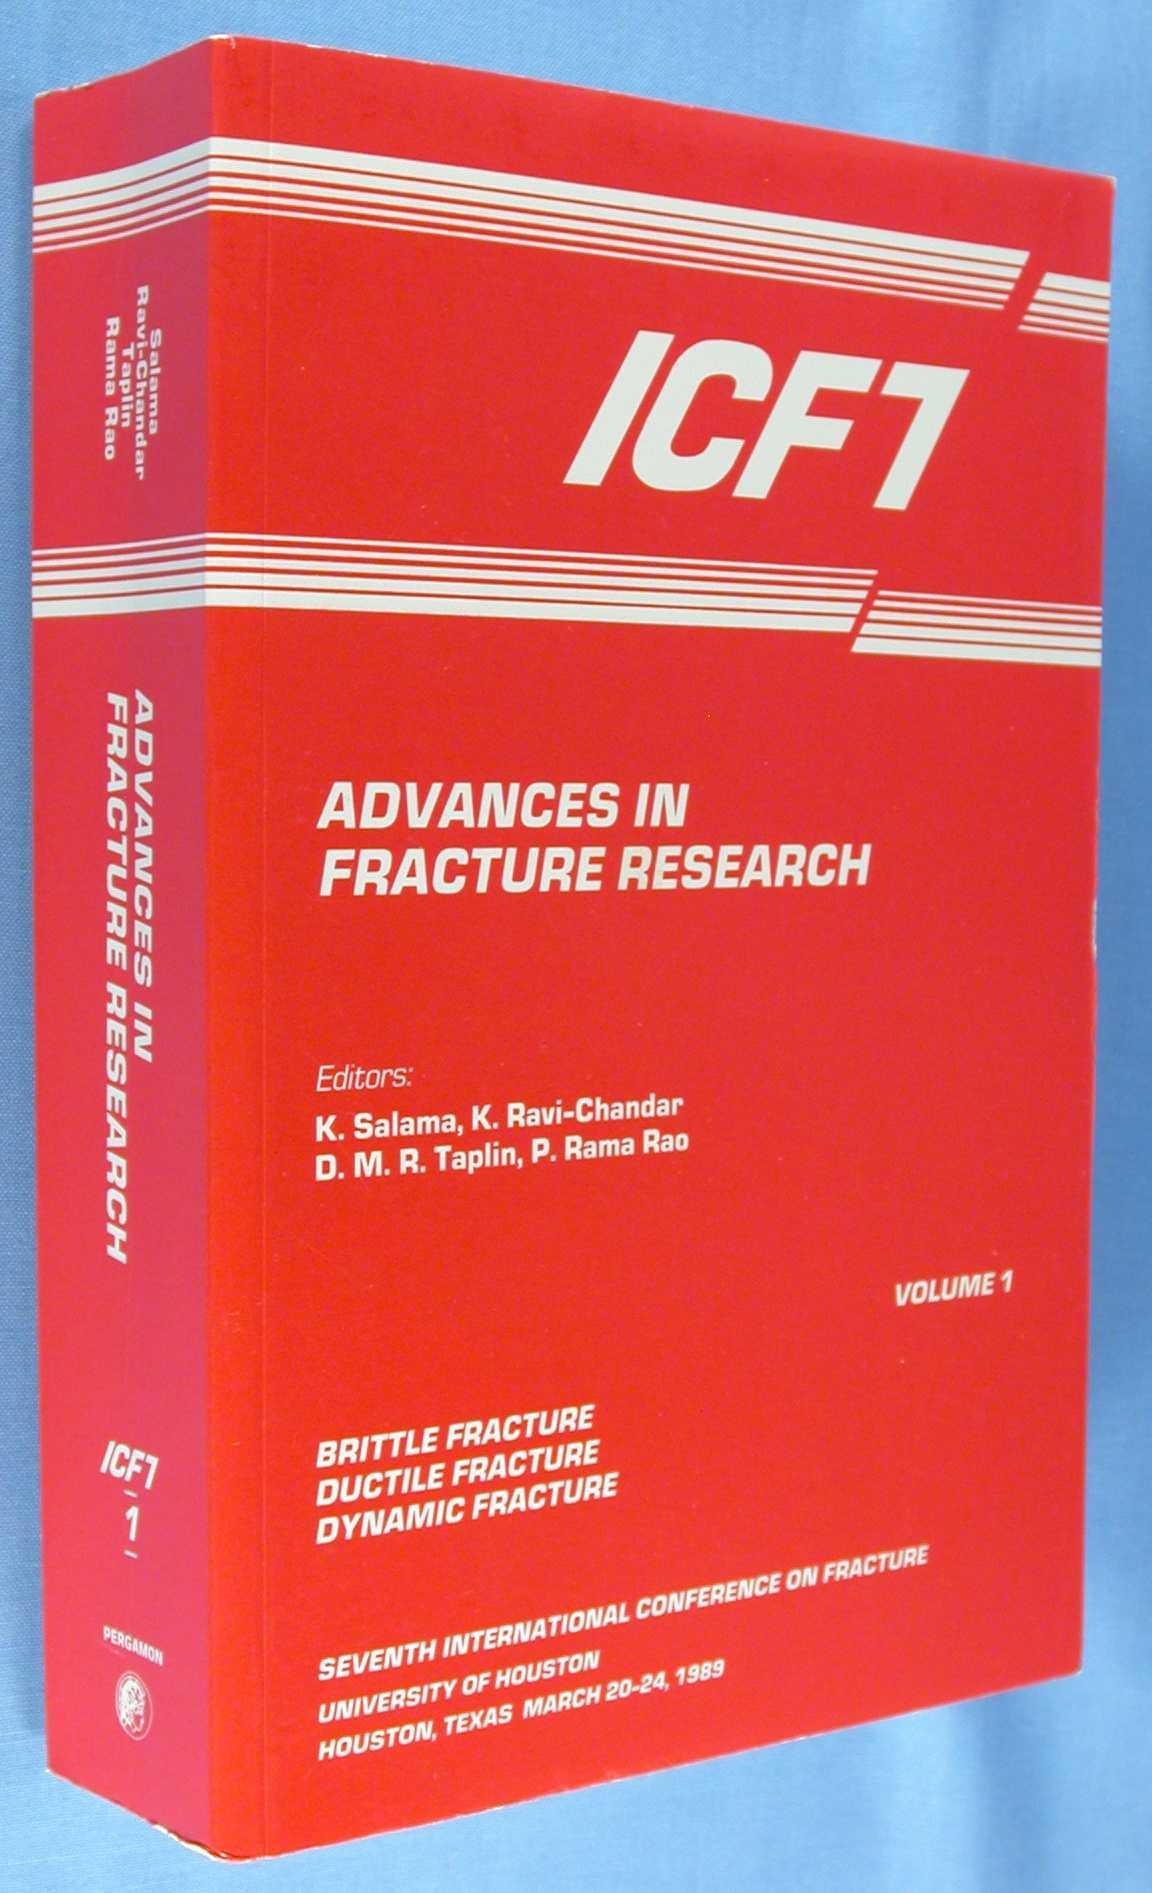 Advances in Fracture Research - Volume 1 :Brittle Fracture, Ductile Fracture, and Dynamic Fracture (ICF7), Salama, K.; K. Ravi-Chandar; D.M.R. Taplin; P. Rama Rao (editors)